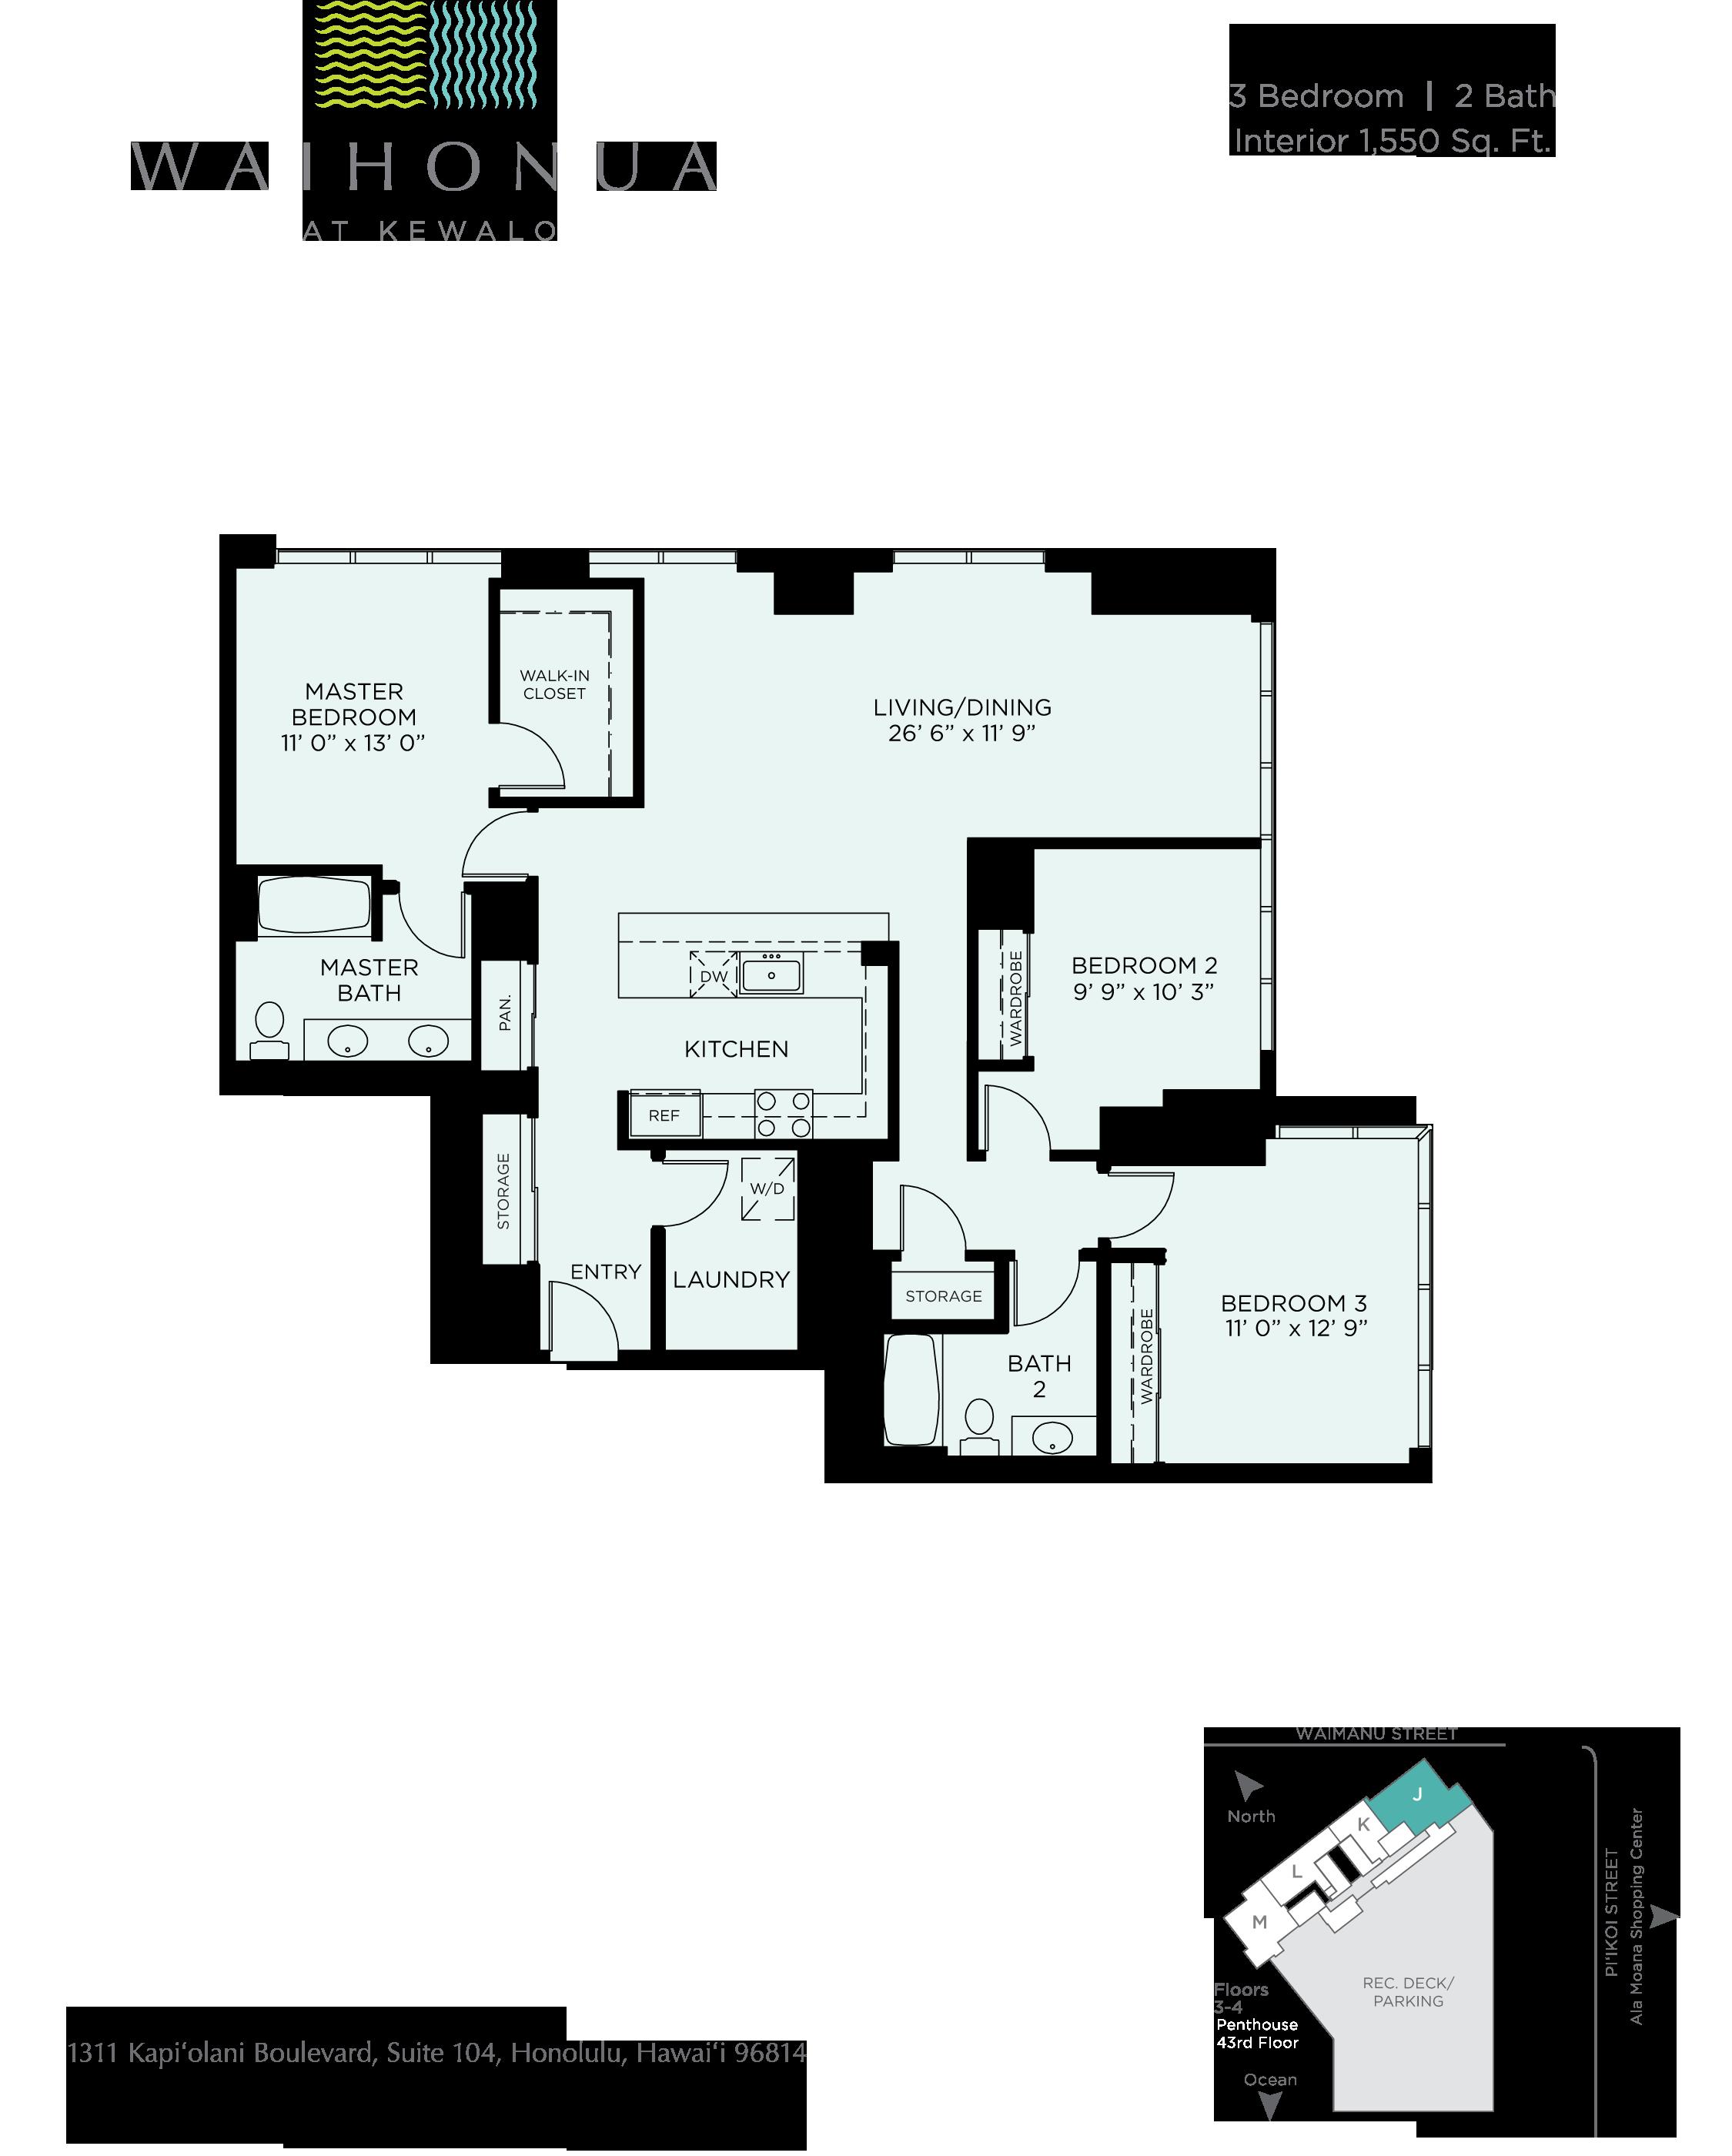 Waihonua Floor Plan J